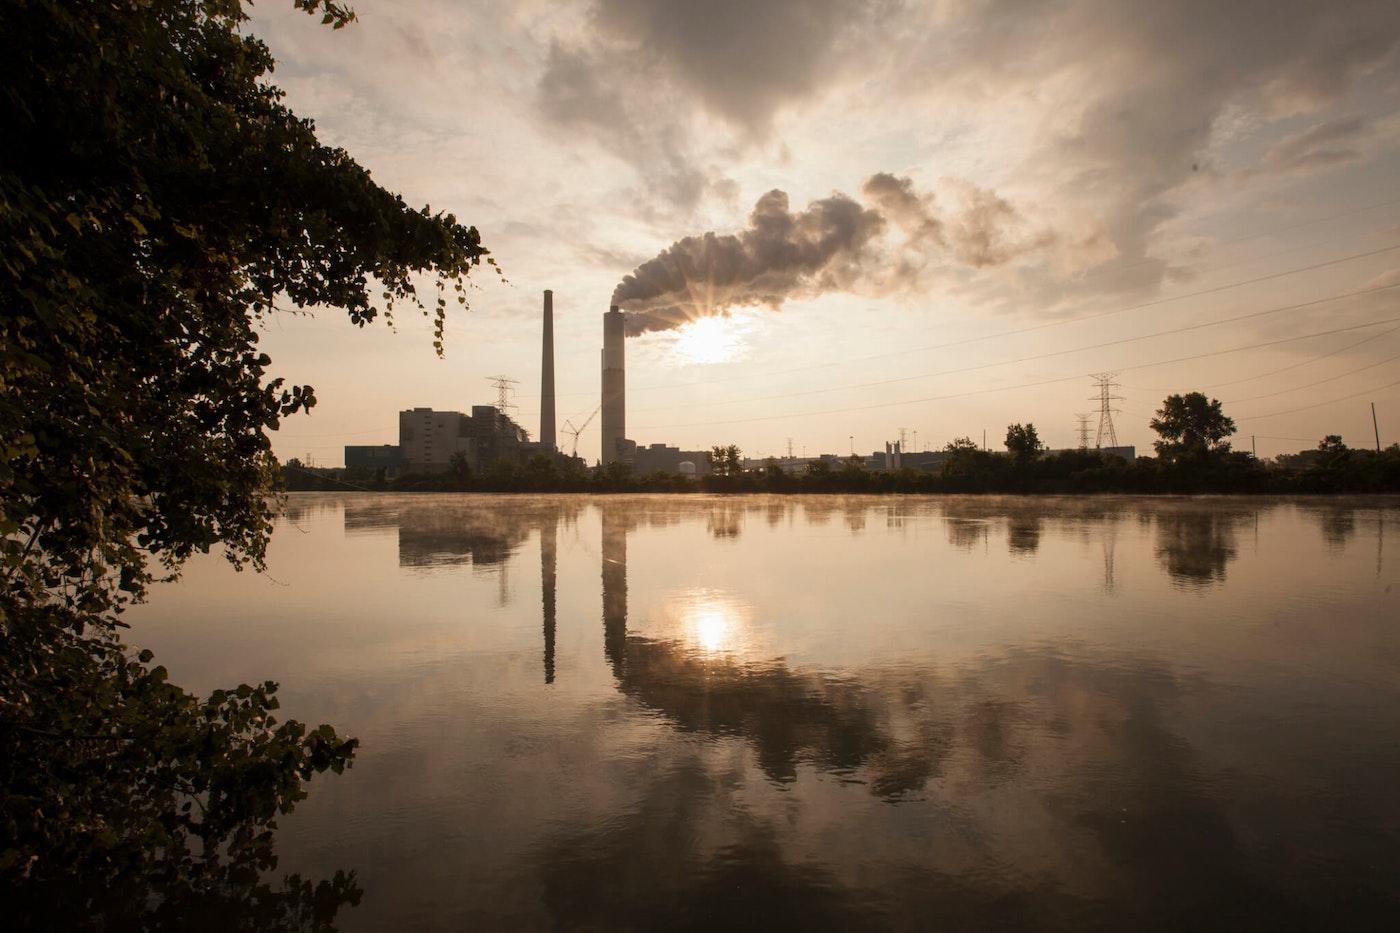 Detroit Edison Power Station and river Raisin at sunset, Monroe, Michigan, USA